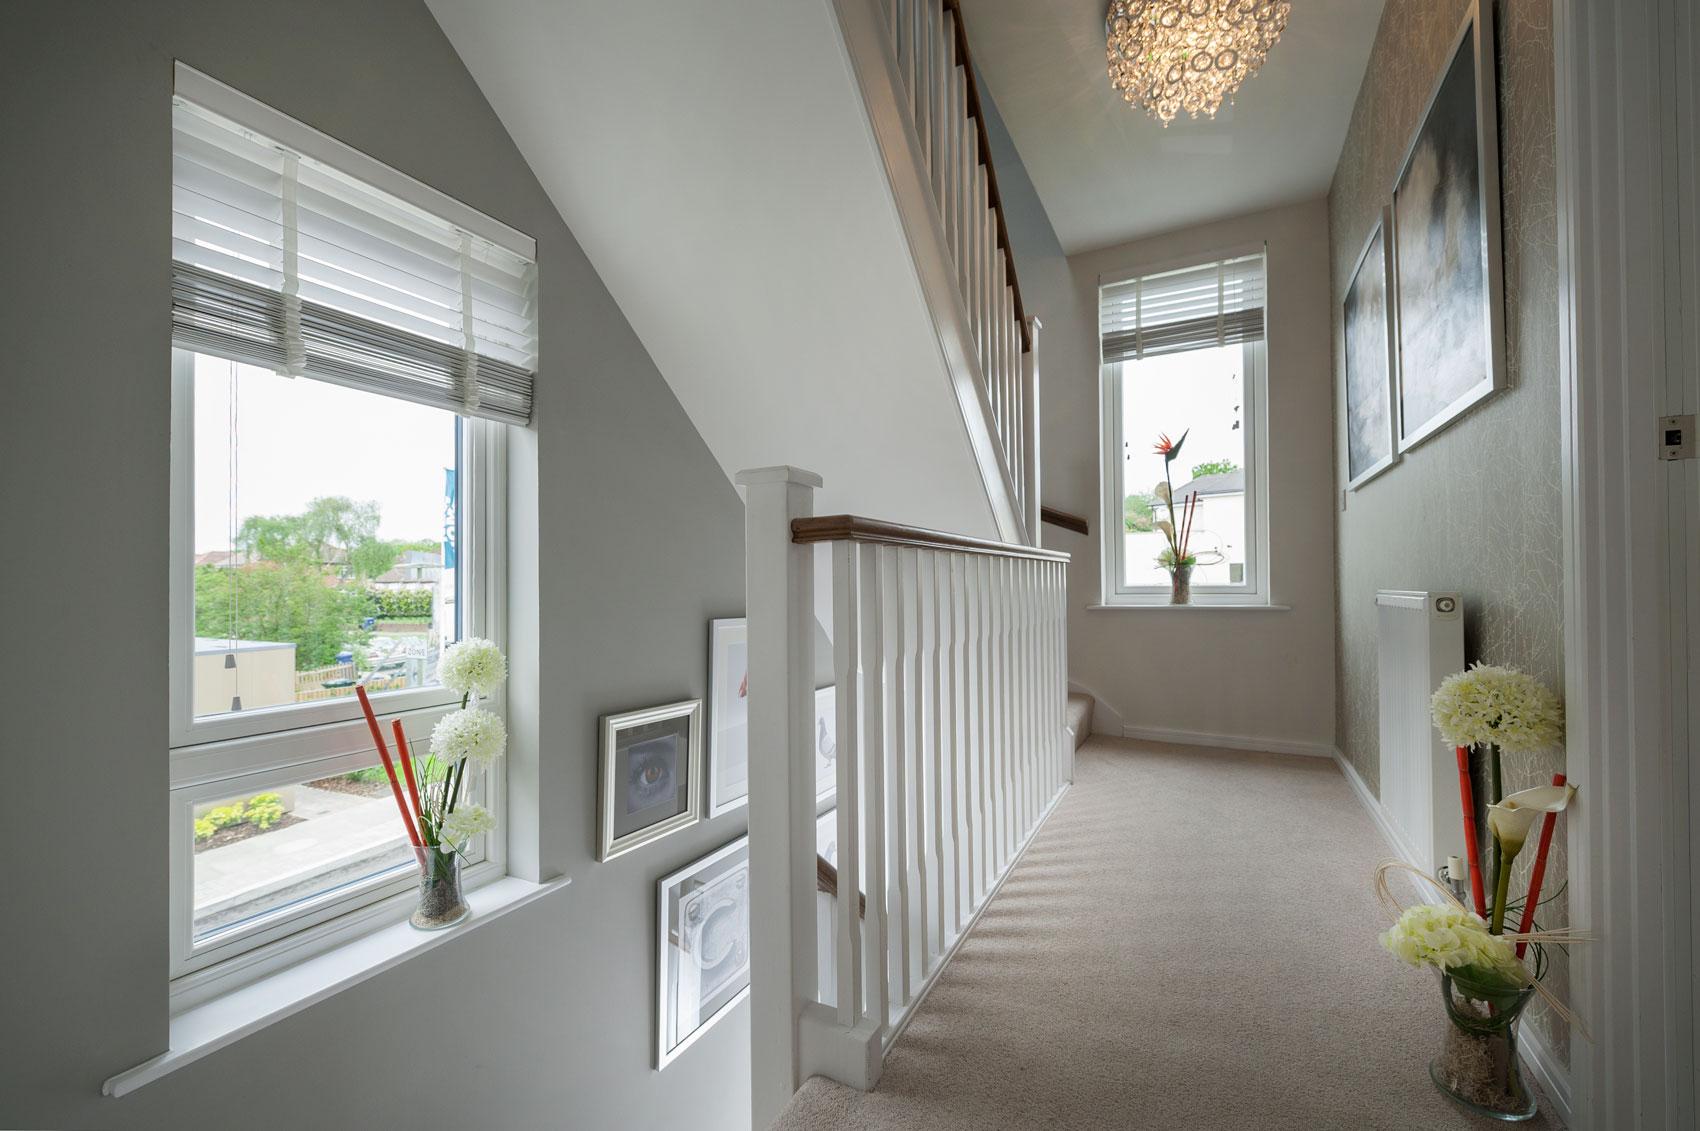 Residence 9 Windows Chigwell